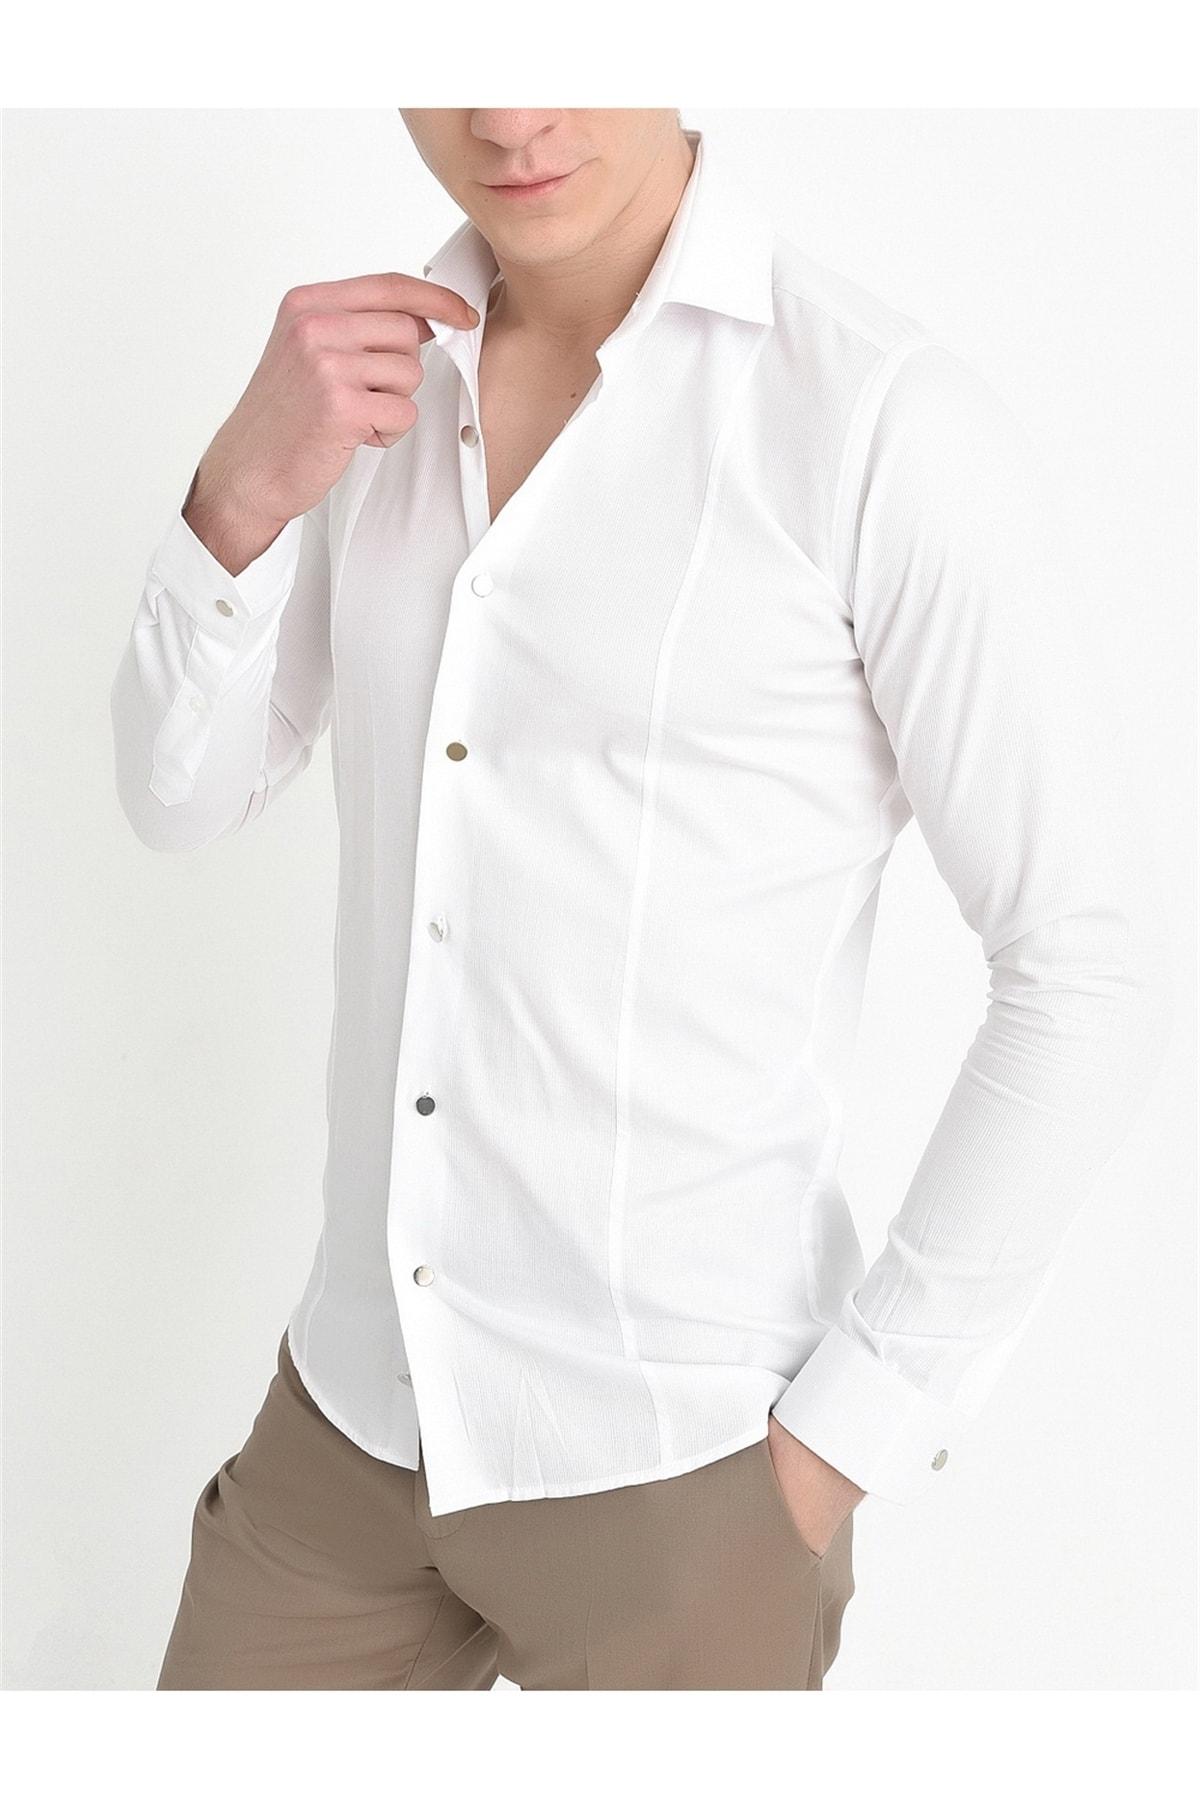 Efor G 1401 Slim Fit Beyaz Spor Gömlek 2